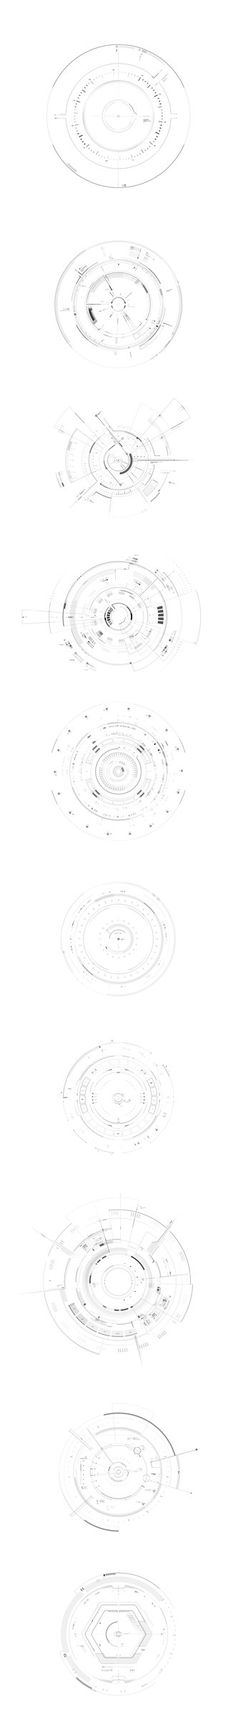 Circles of V6 by z-design on deviantART